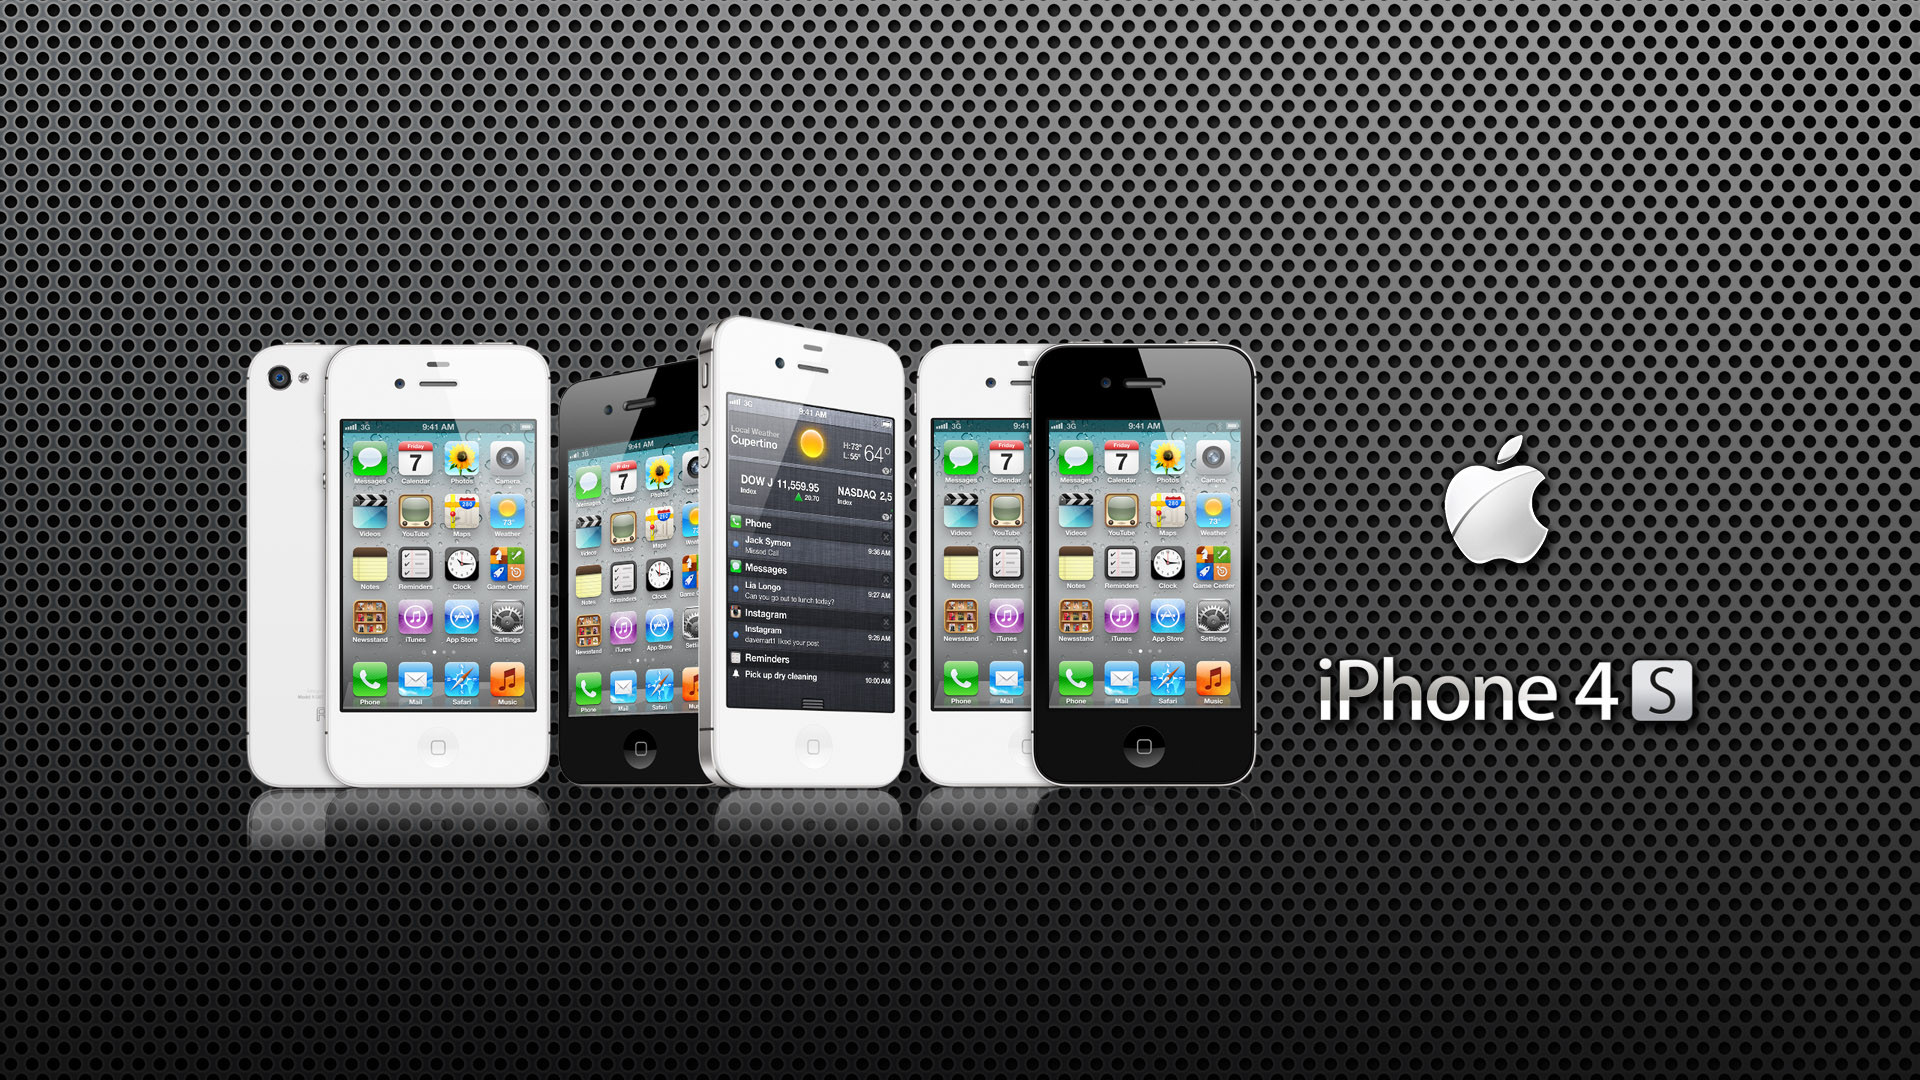 Iphone 4s Wallpaper Apple iPhone 4S 1920x1080